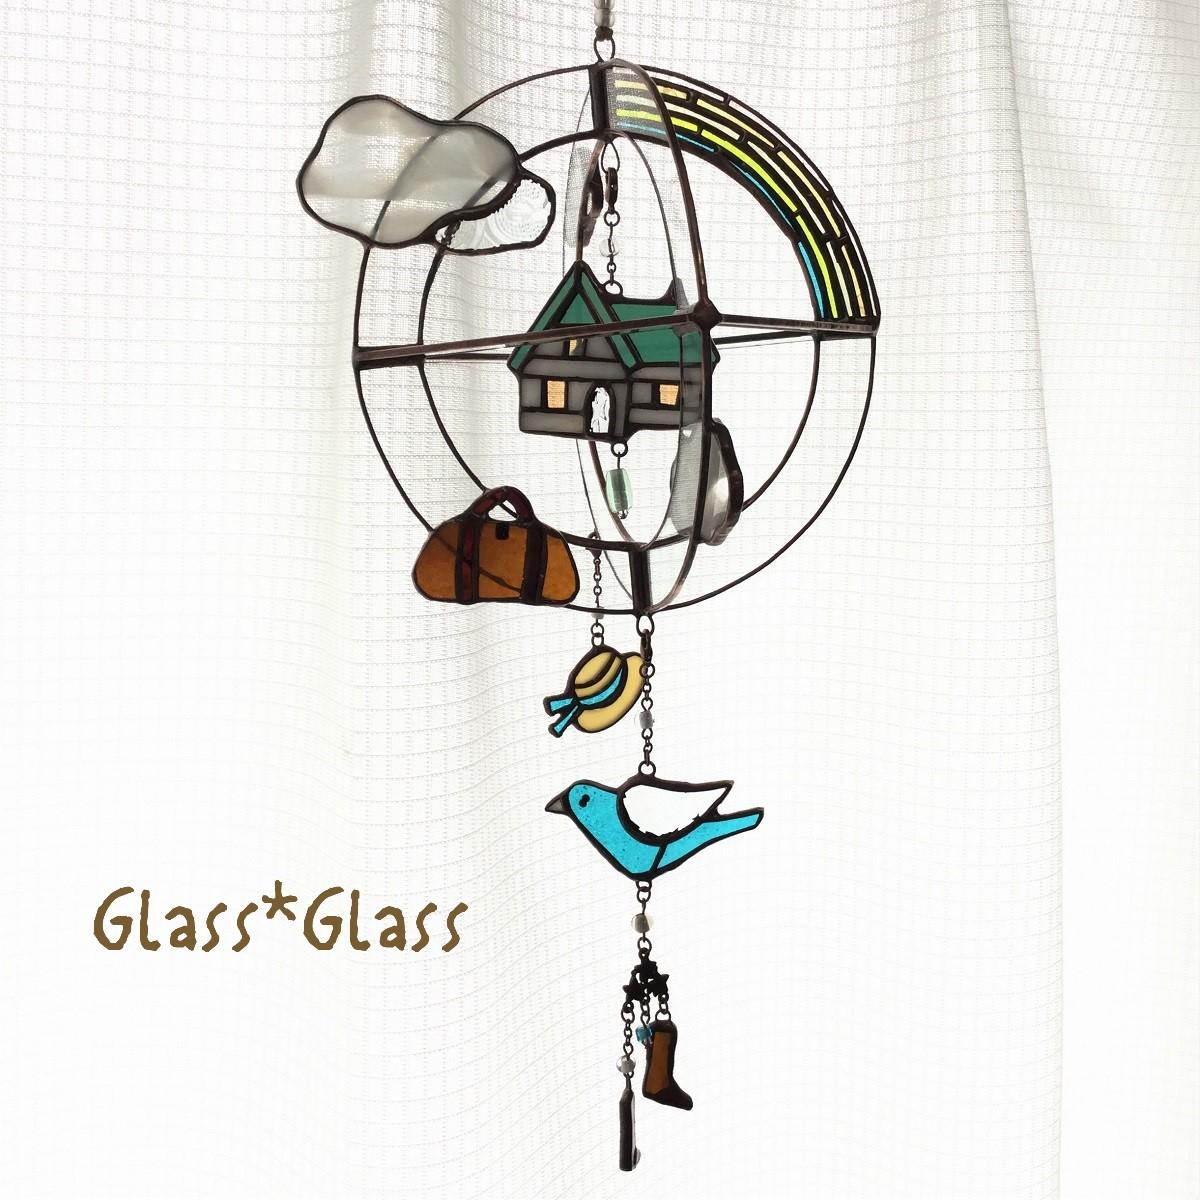 f:id:glassglassmegu:20210520143921j:plain